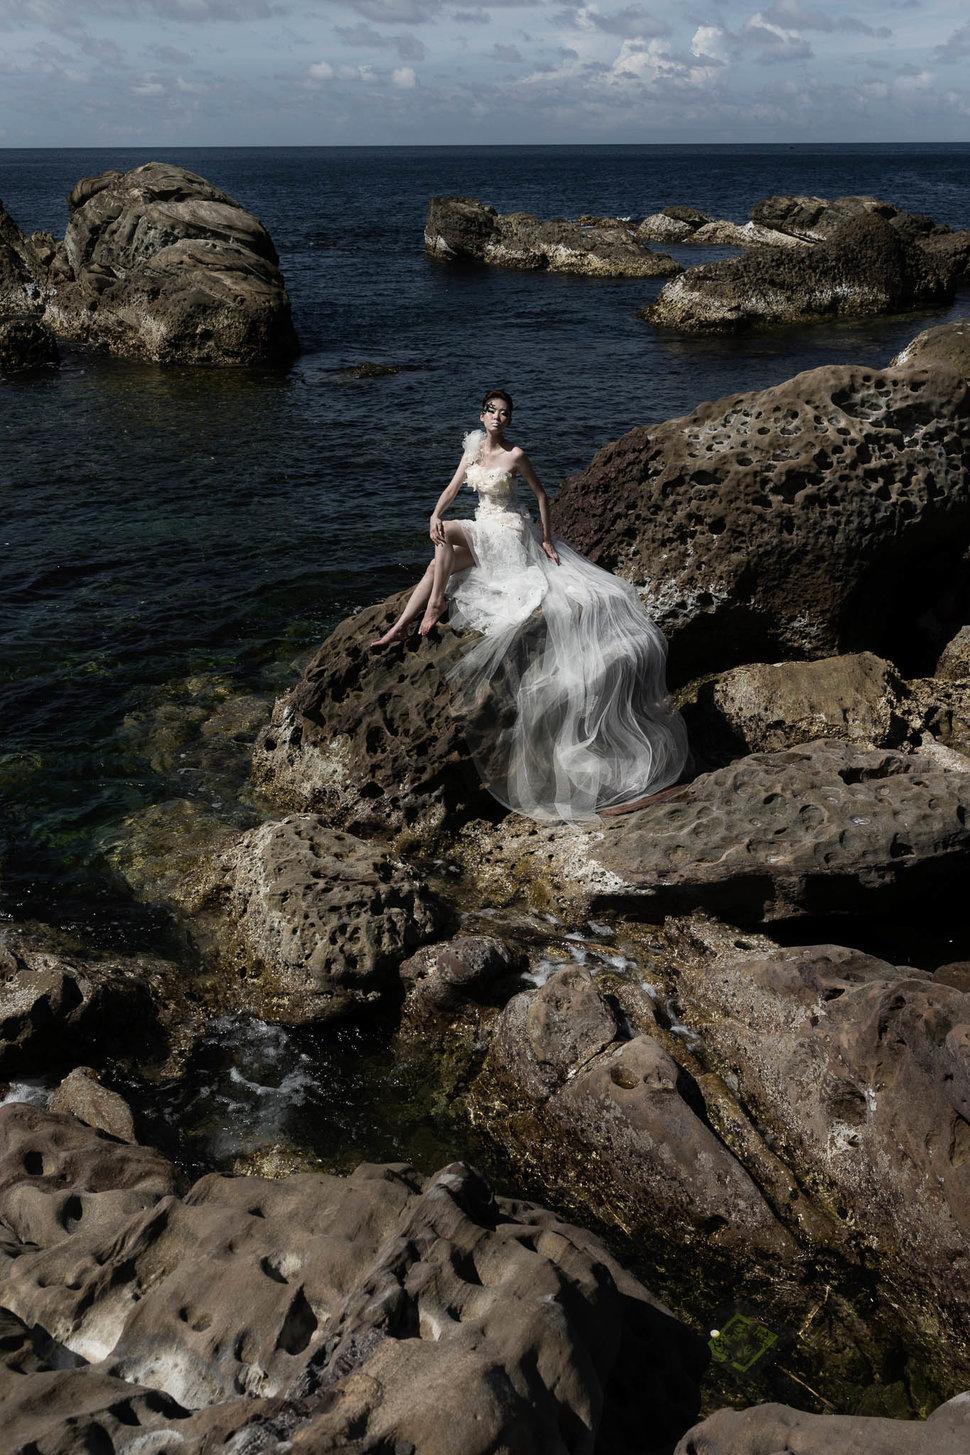 18PHOTO自主婚紗-自信與優雅的征服(編號:214898) - 18PHOTO 婚紗影像攝影工作室 - 結婚吧